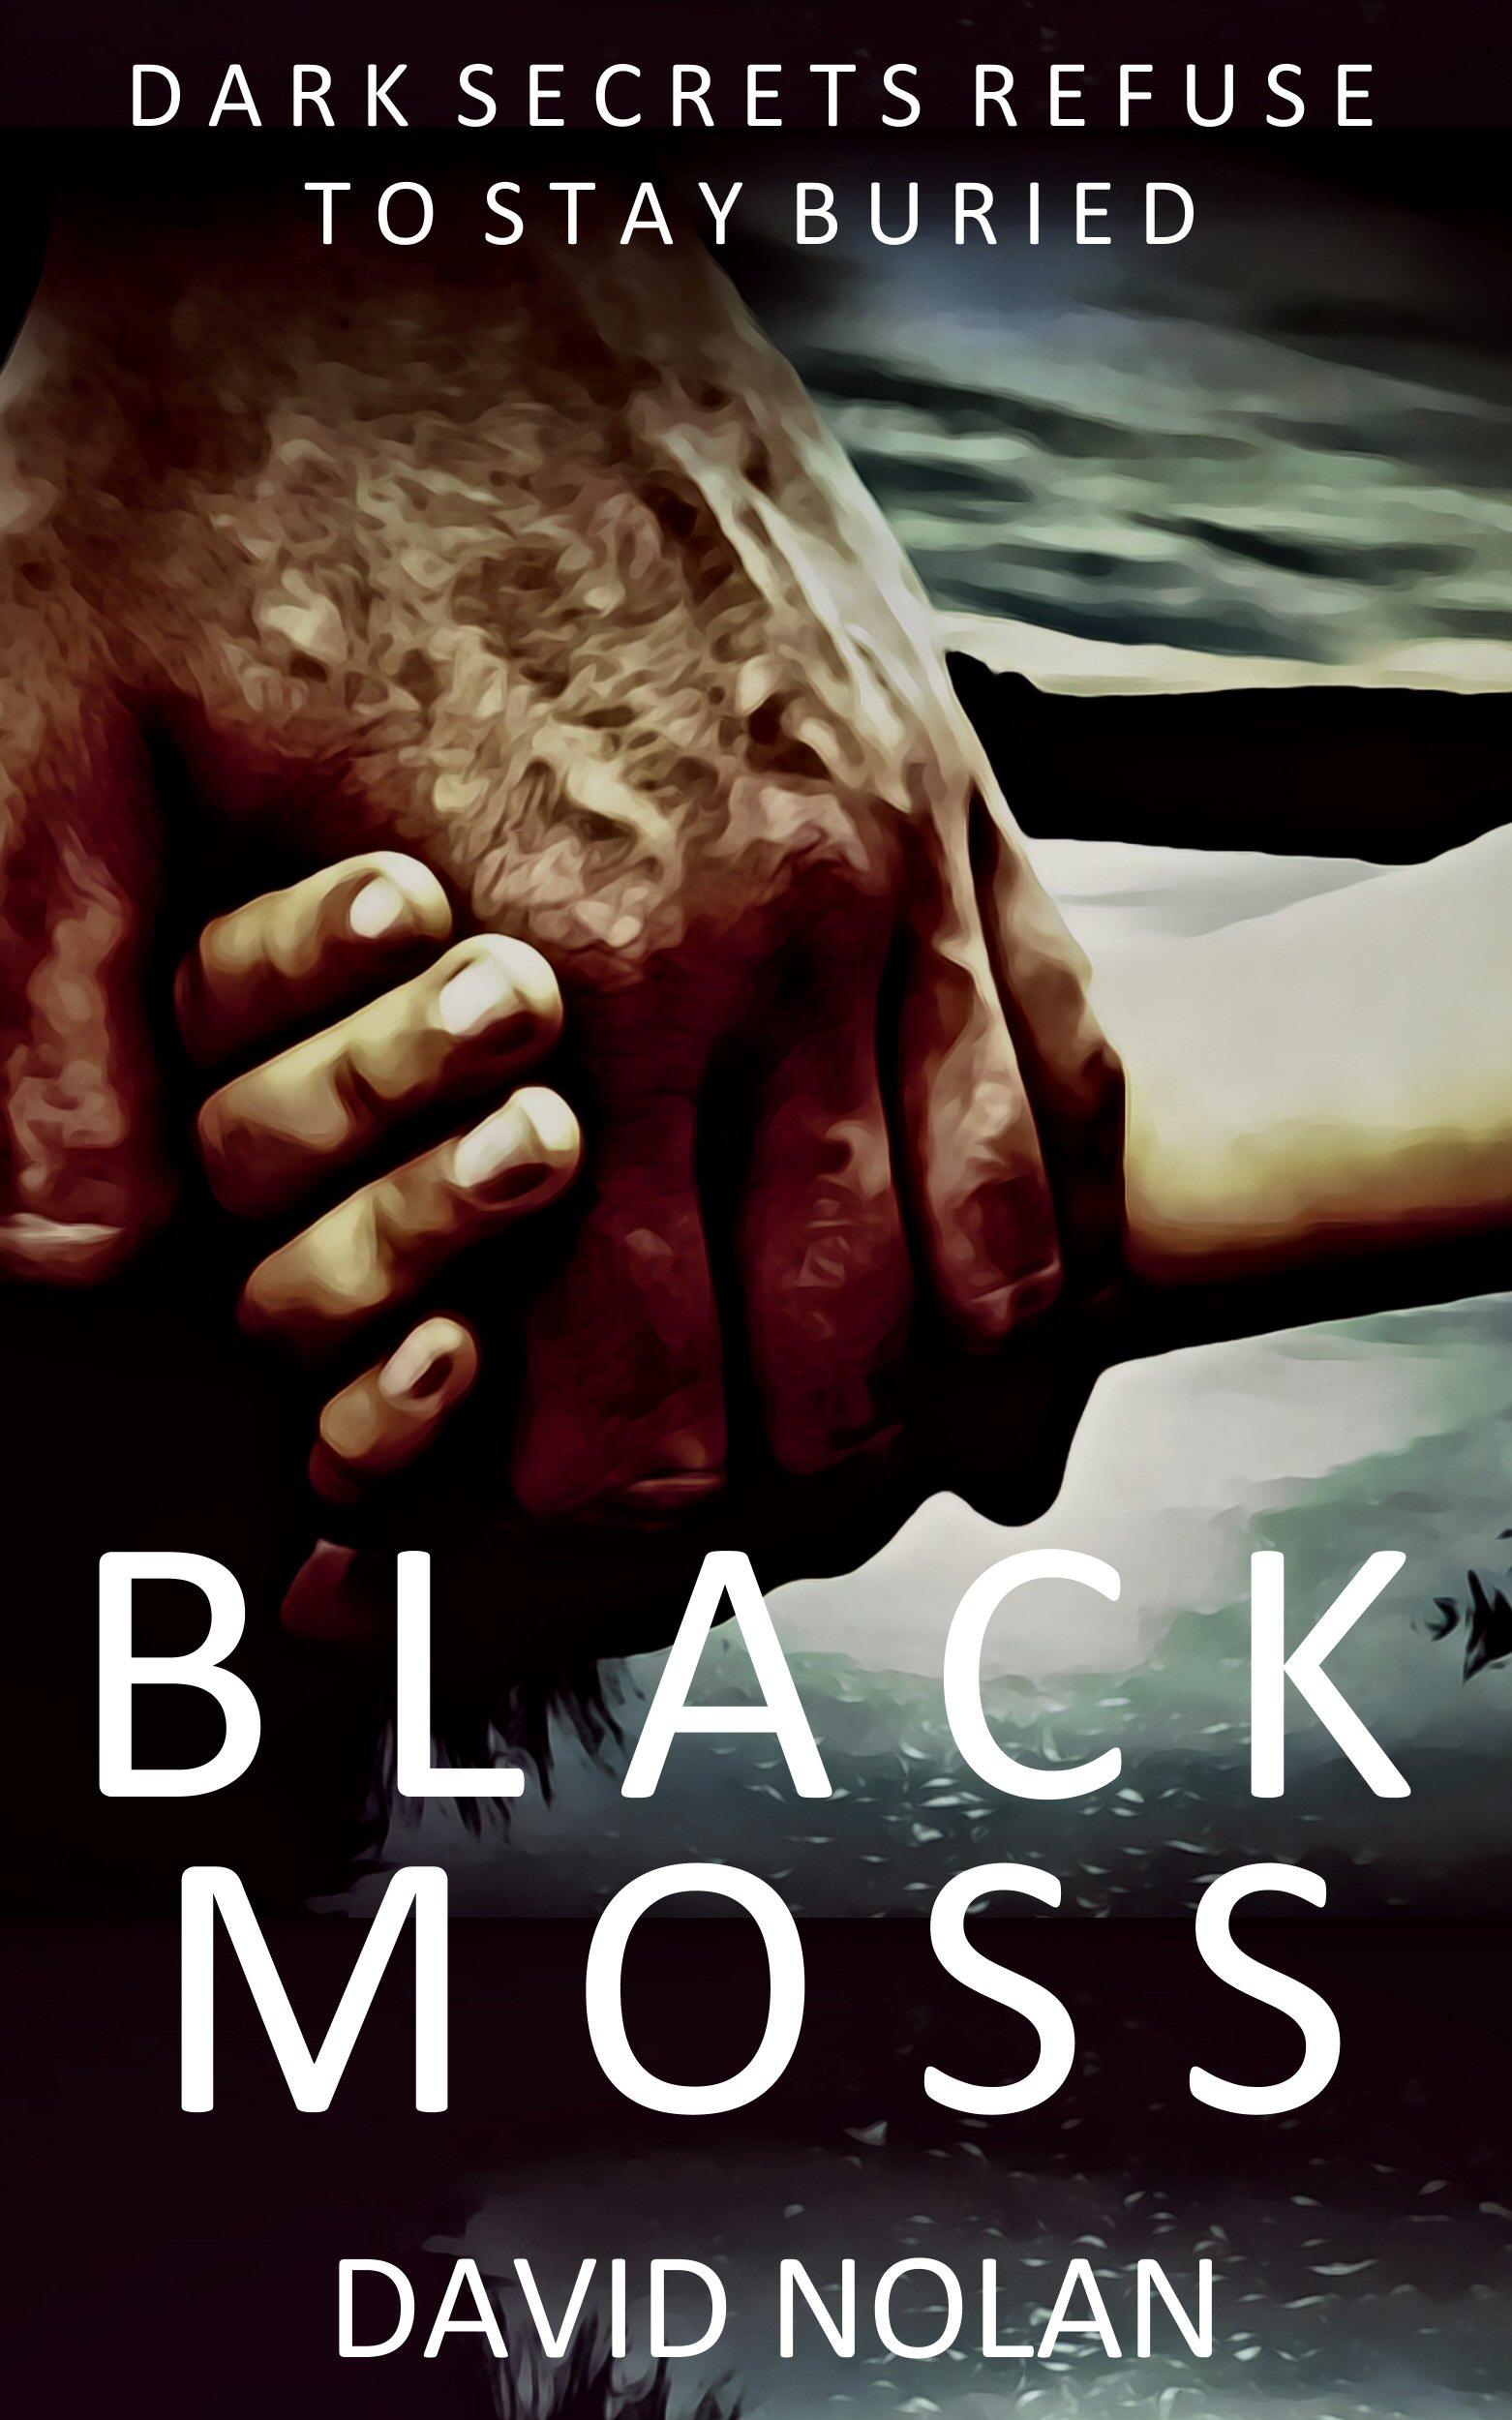 BlackMossSept18thJPEG